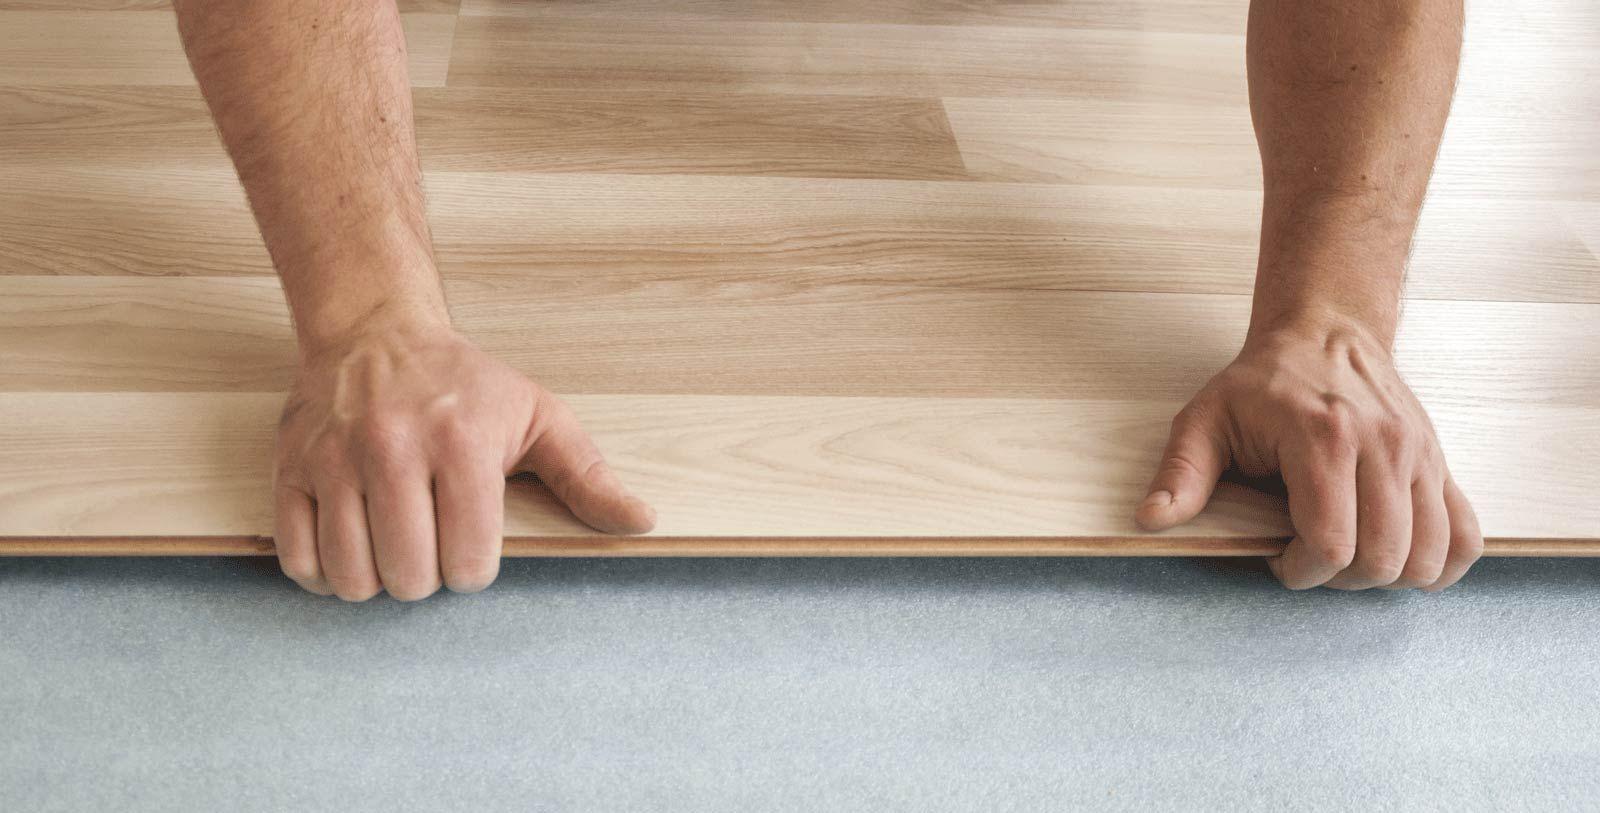 Removing Carpet And Installing Laminate Flooring Cost Uk